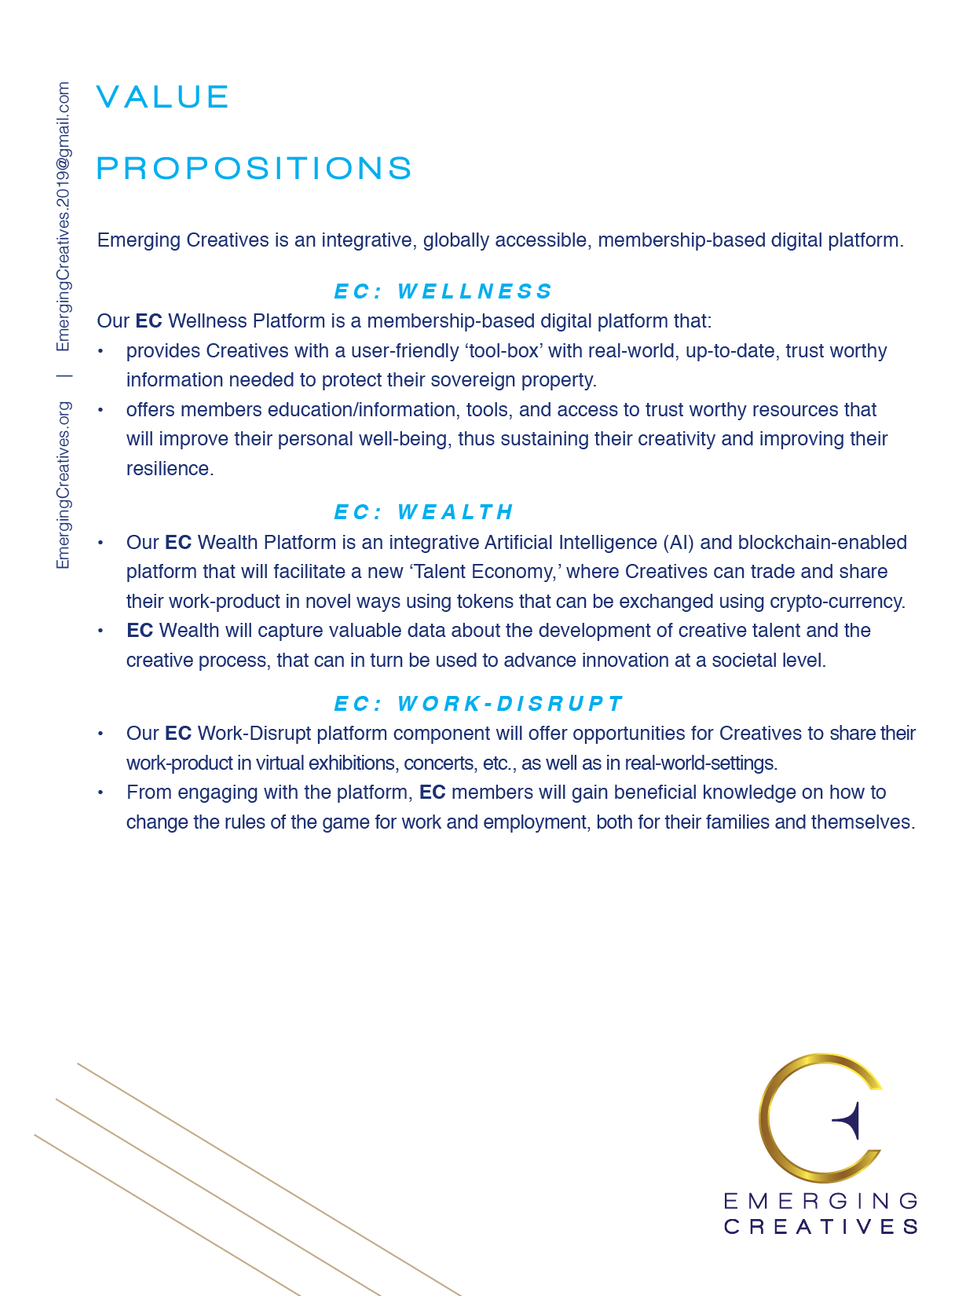 Emerging Creatives Sponsorship Value Pro